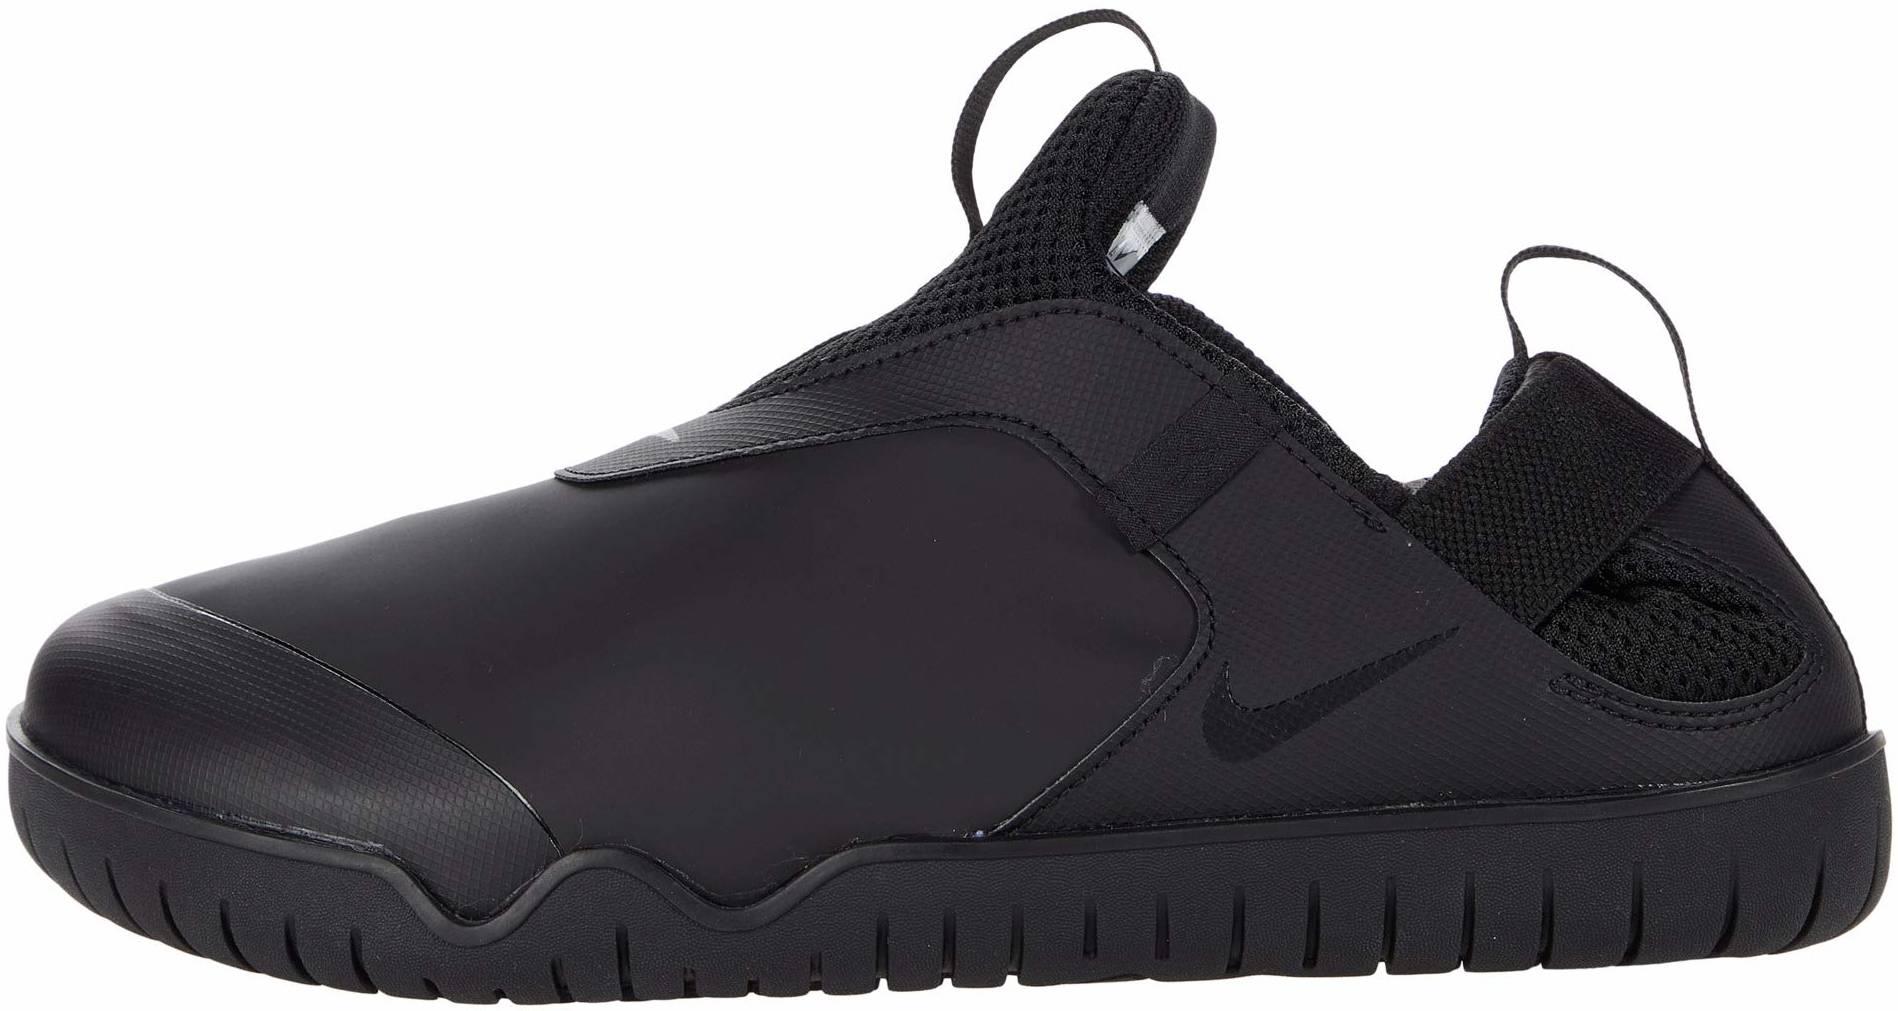 Nike Zoom Pulse sneakers in 4 colors (only $100) | RunRepeat